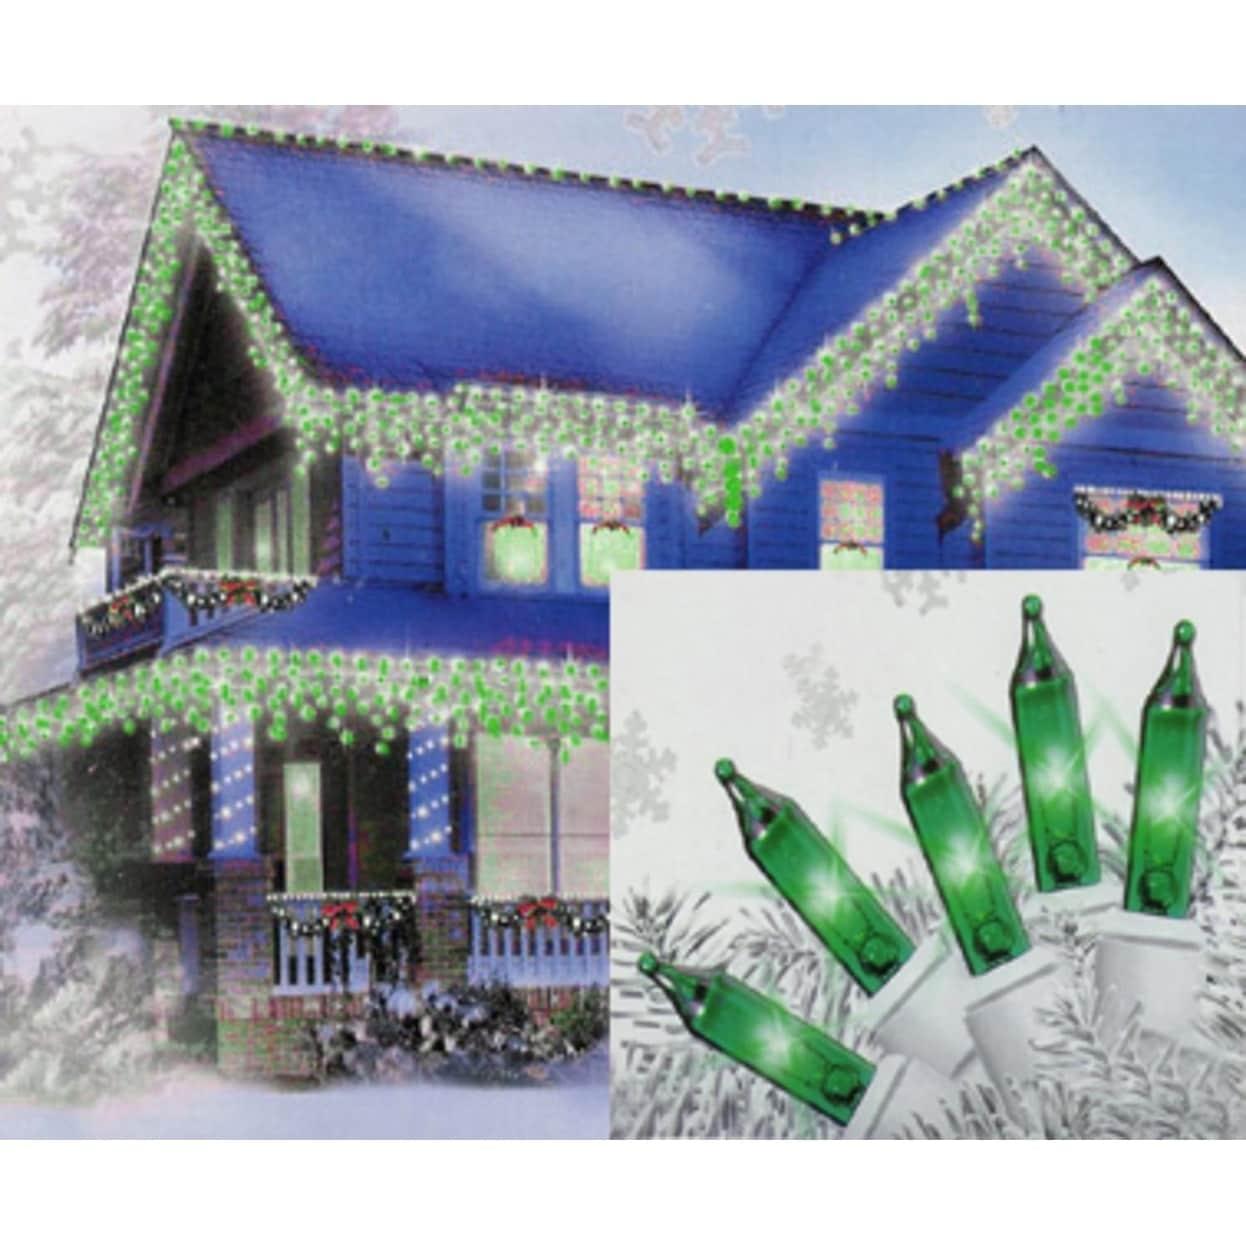 Sienna Set of 100 Green Mini Icicle Christmas Lights - Wh...